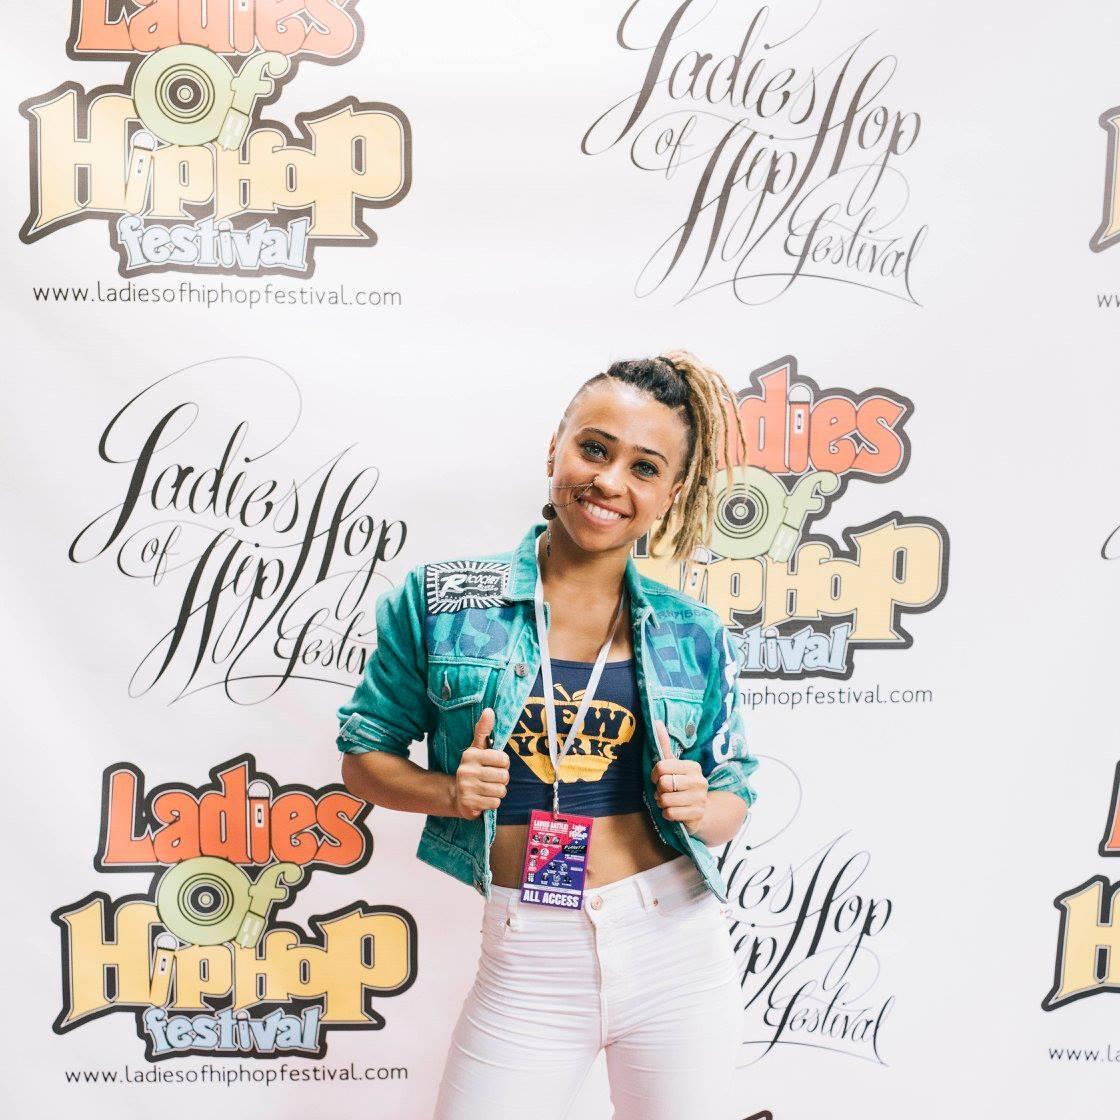 Photo by Melika Dez for Ladies of Hip Hop Festival 2017 (Dancehall Judge)